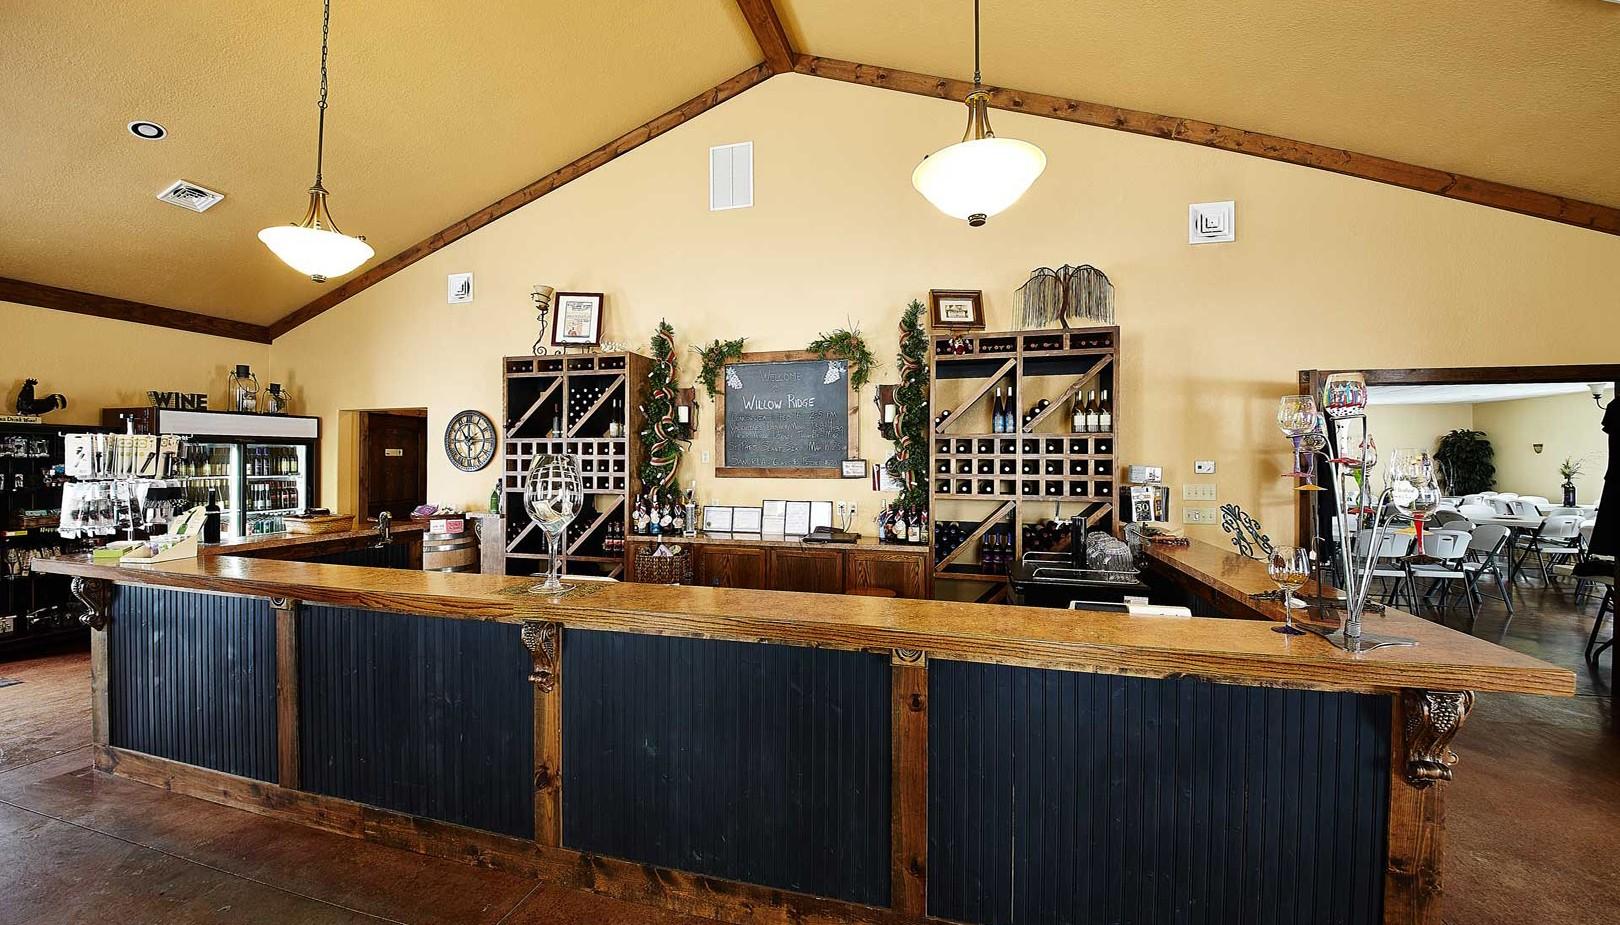 lake-shelbyville-wineries-willow-ridge